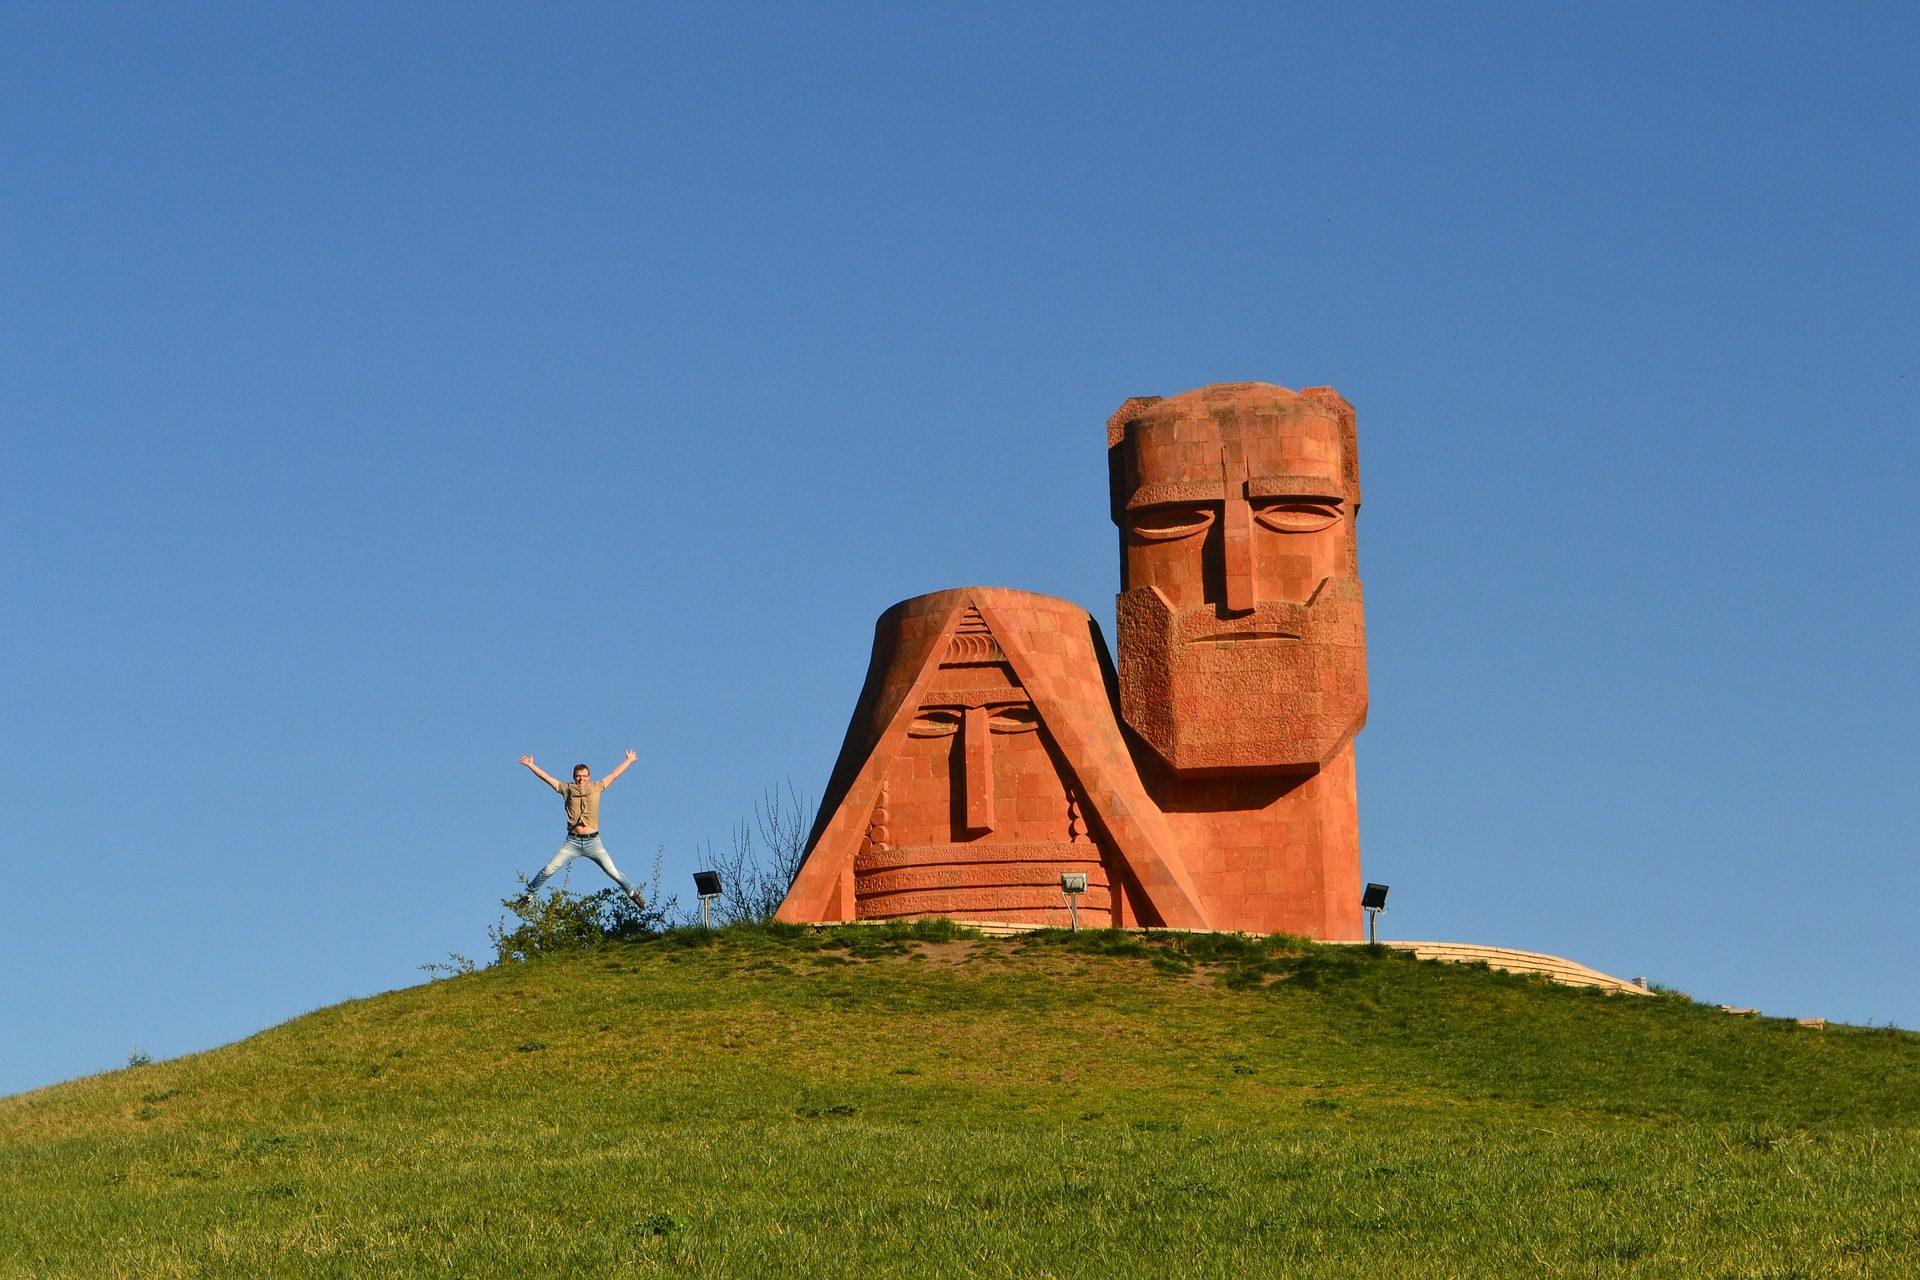 statue de, Monument, Totem, Hill, homme, sauter - Fonds d'écran HD - Professor-falken.com